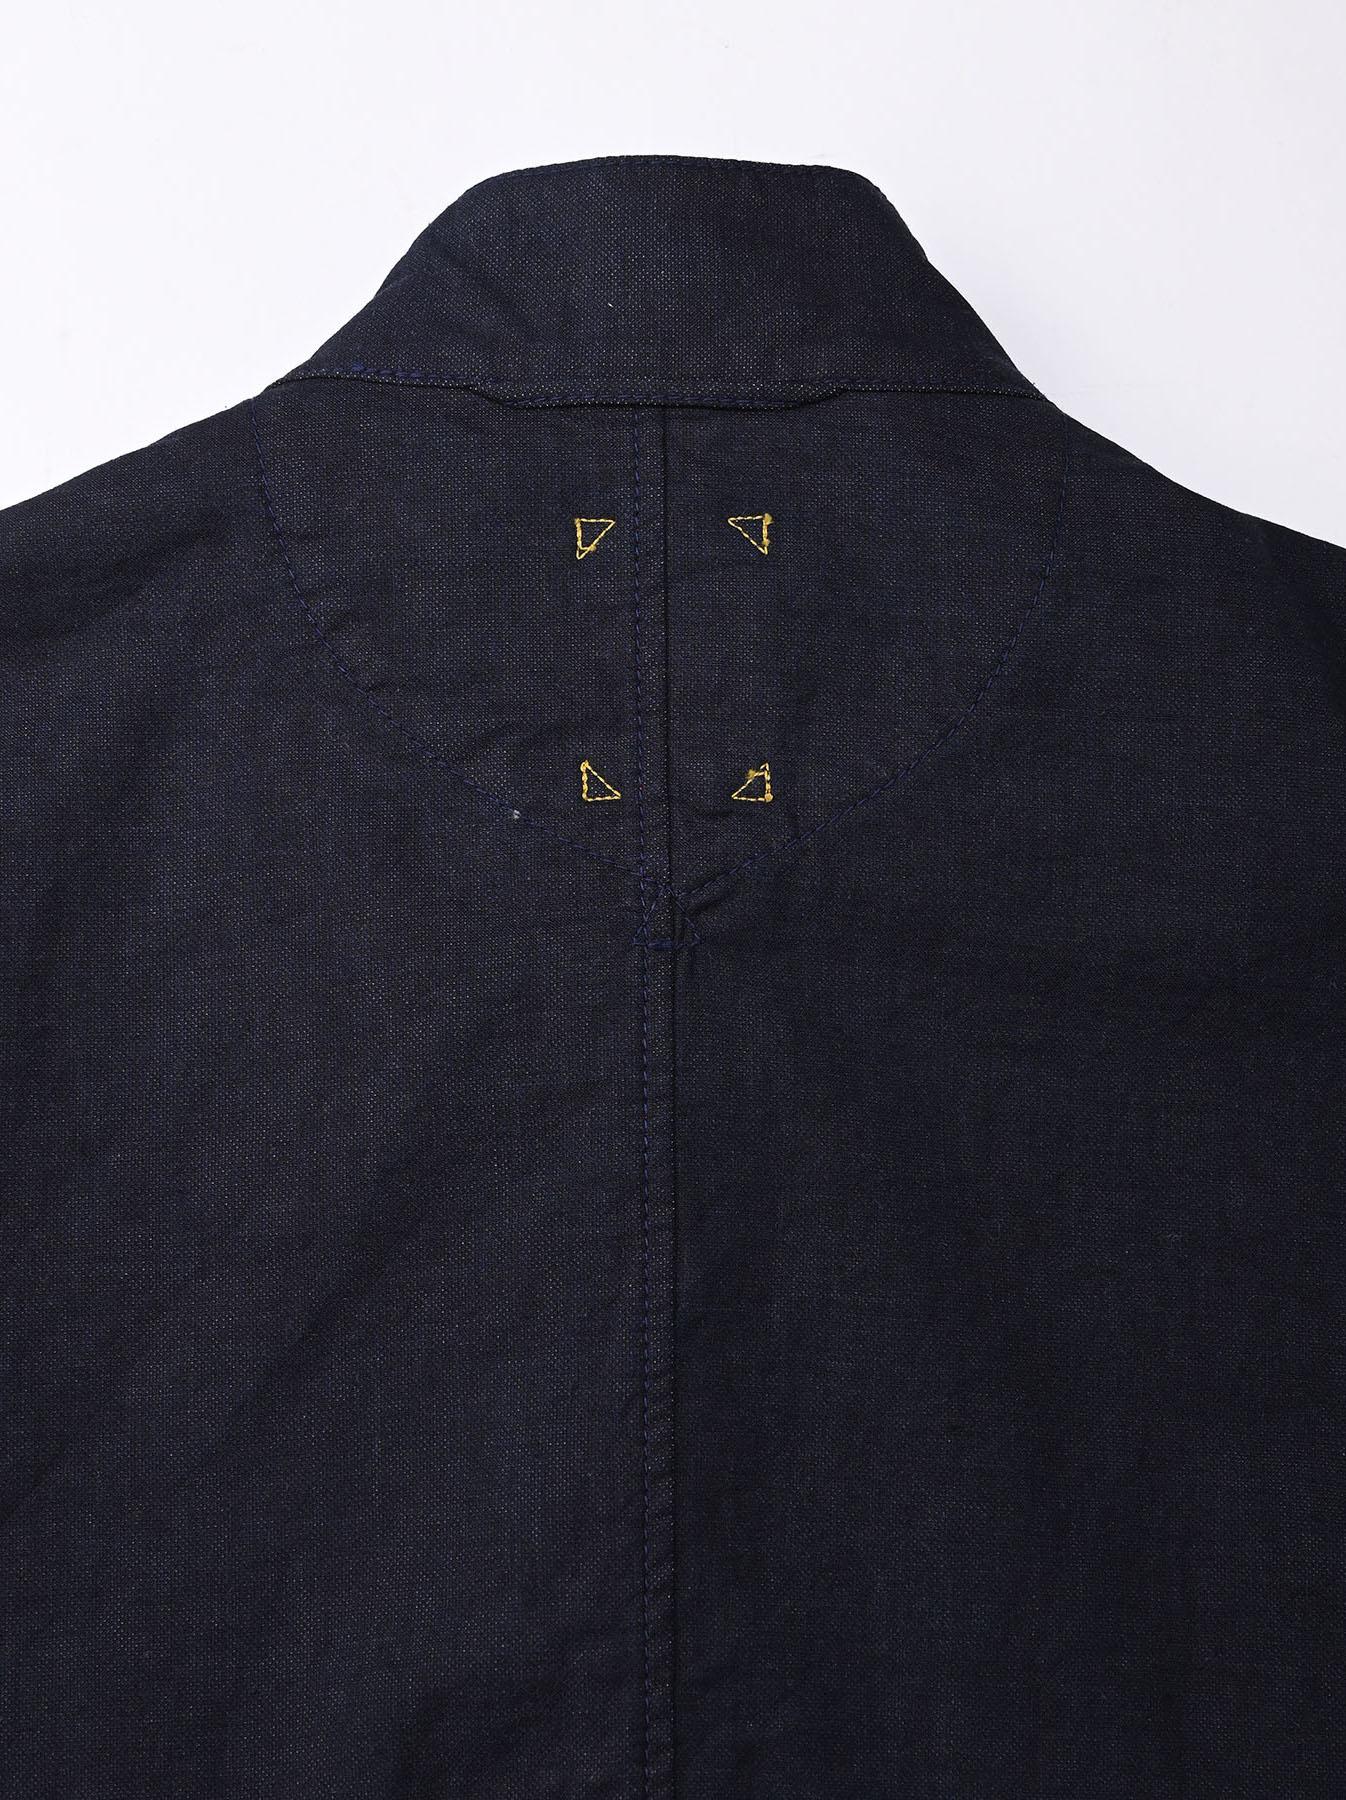 Indigo Double Woven 908 Shirt Jacket (0421)-9